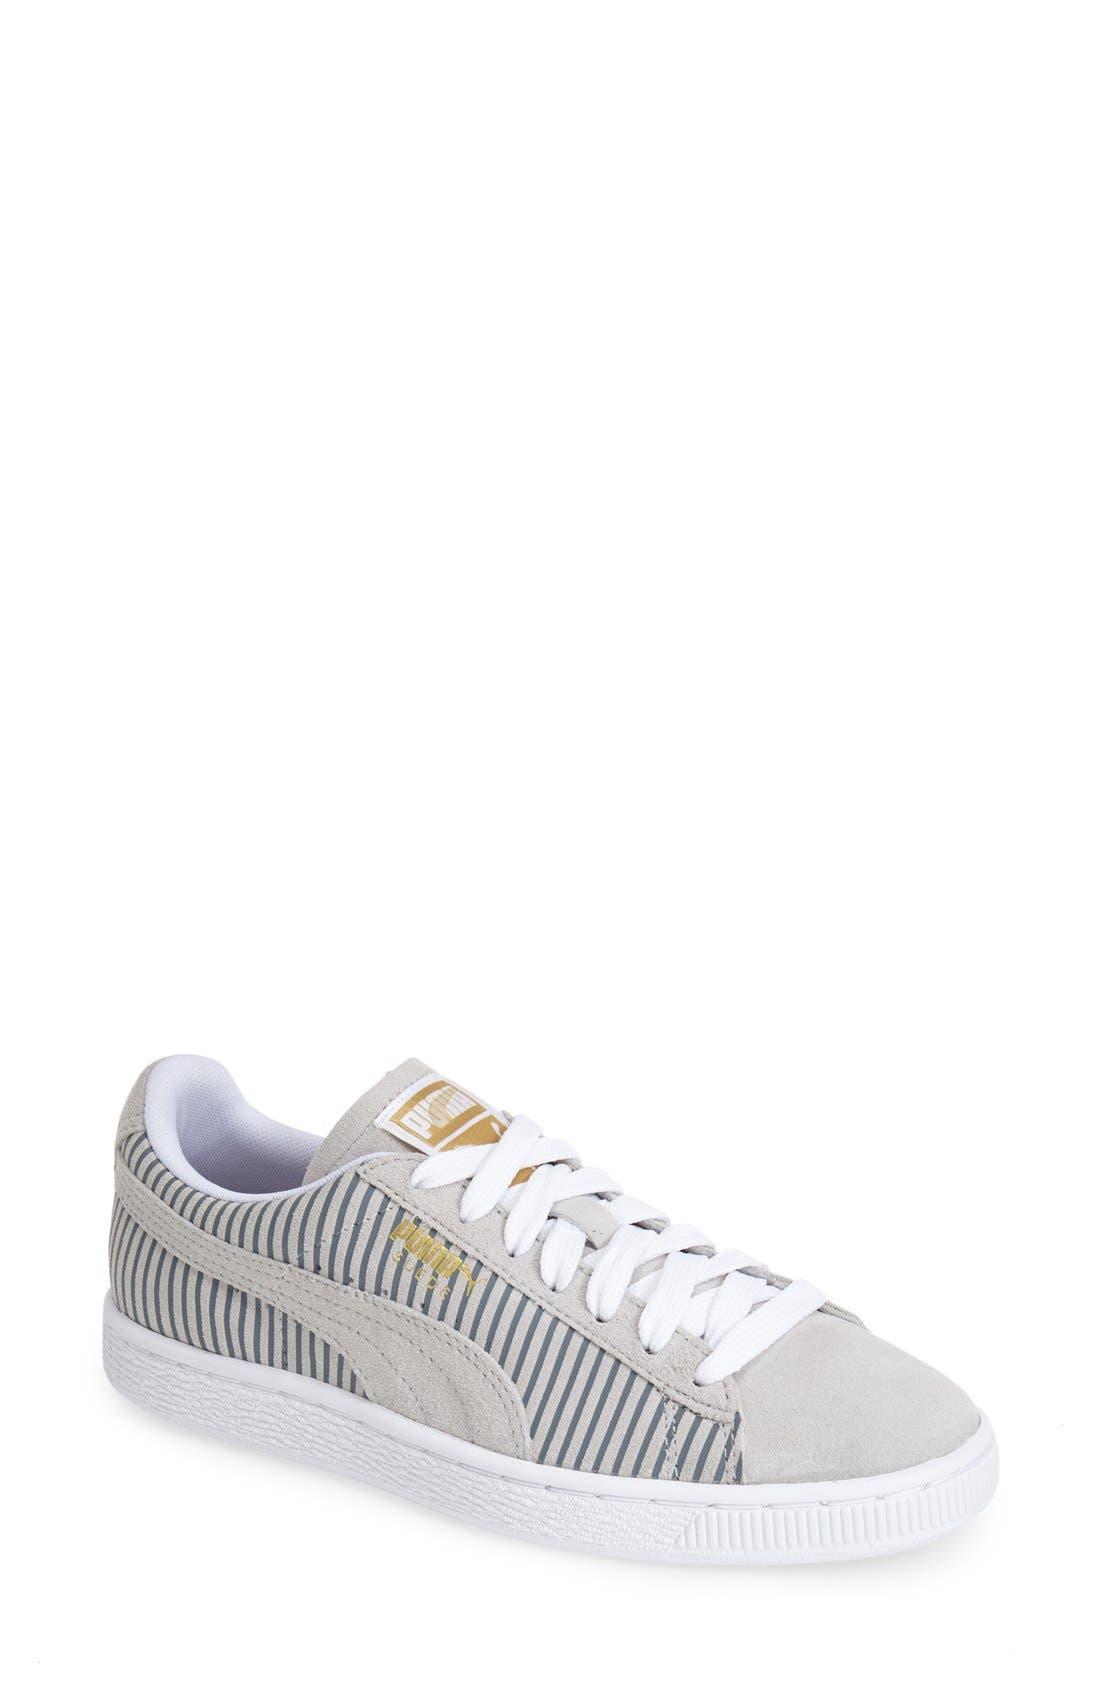 Main Image - PUMA 'Suede Classic' Sneaker (Women)